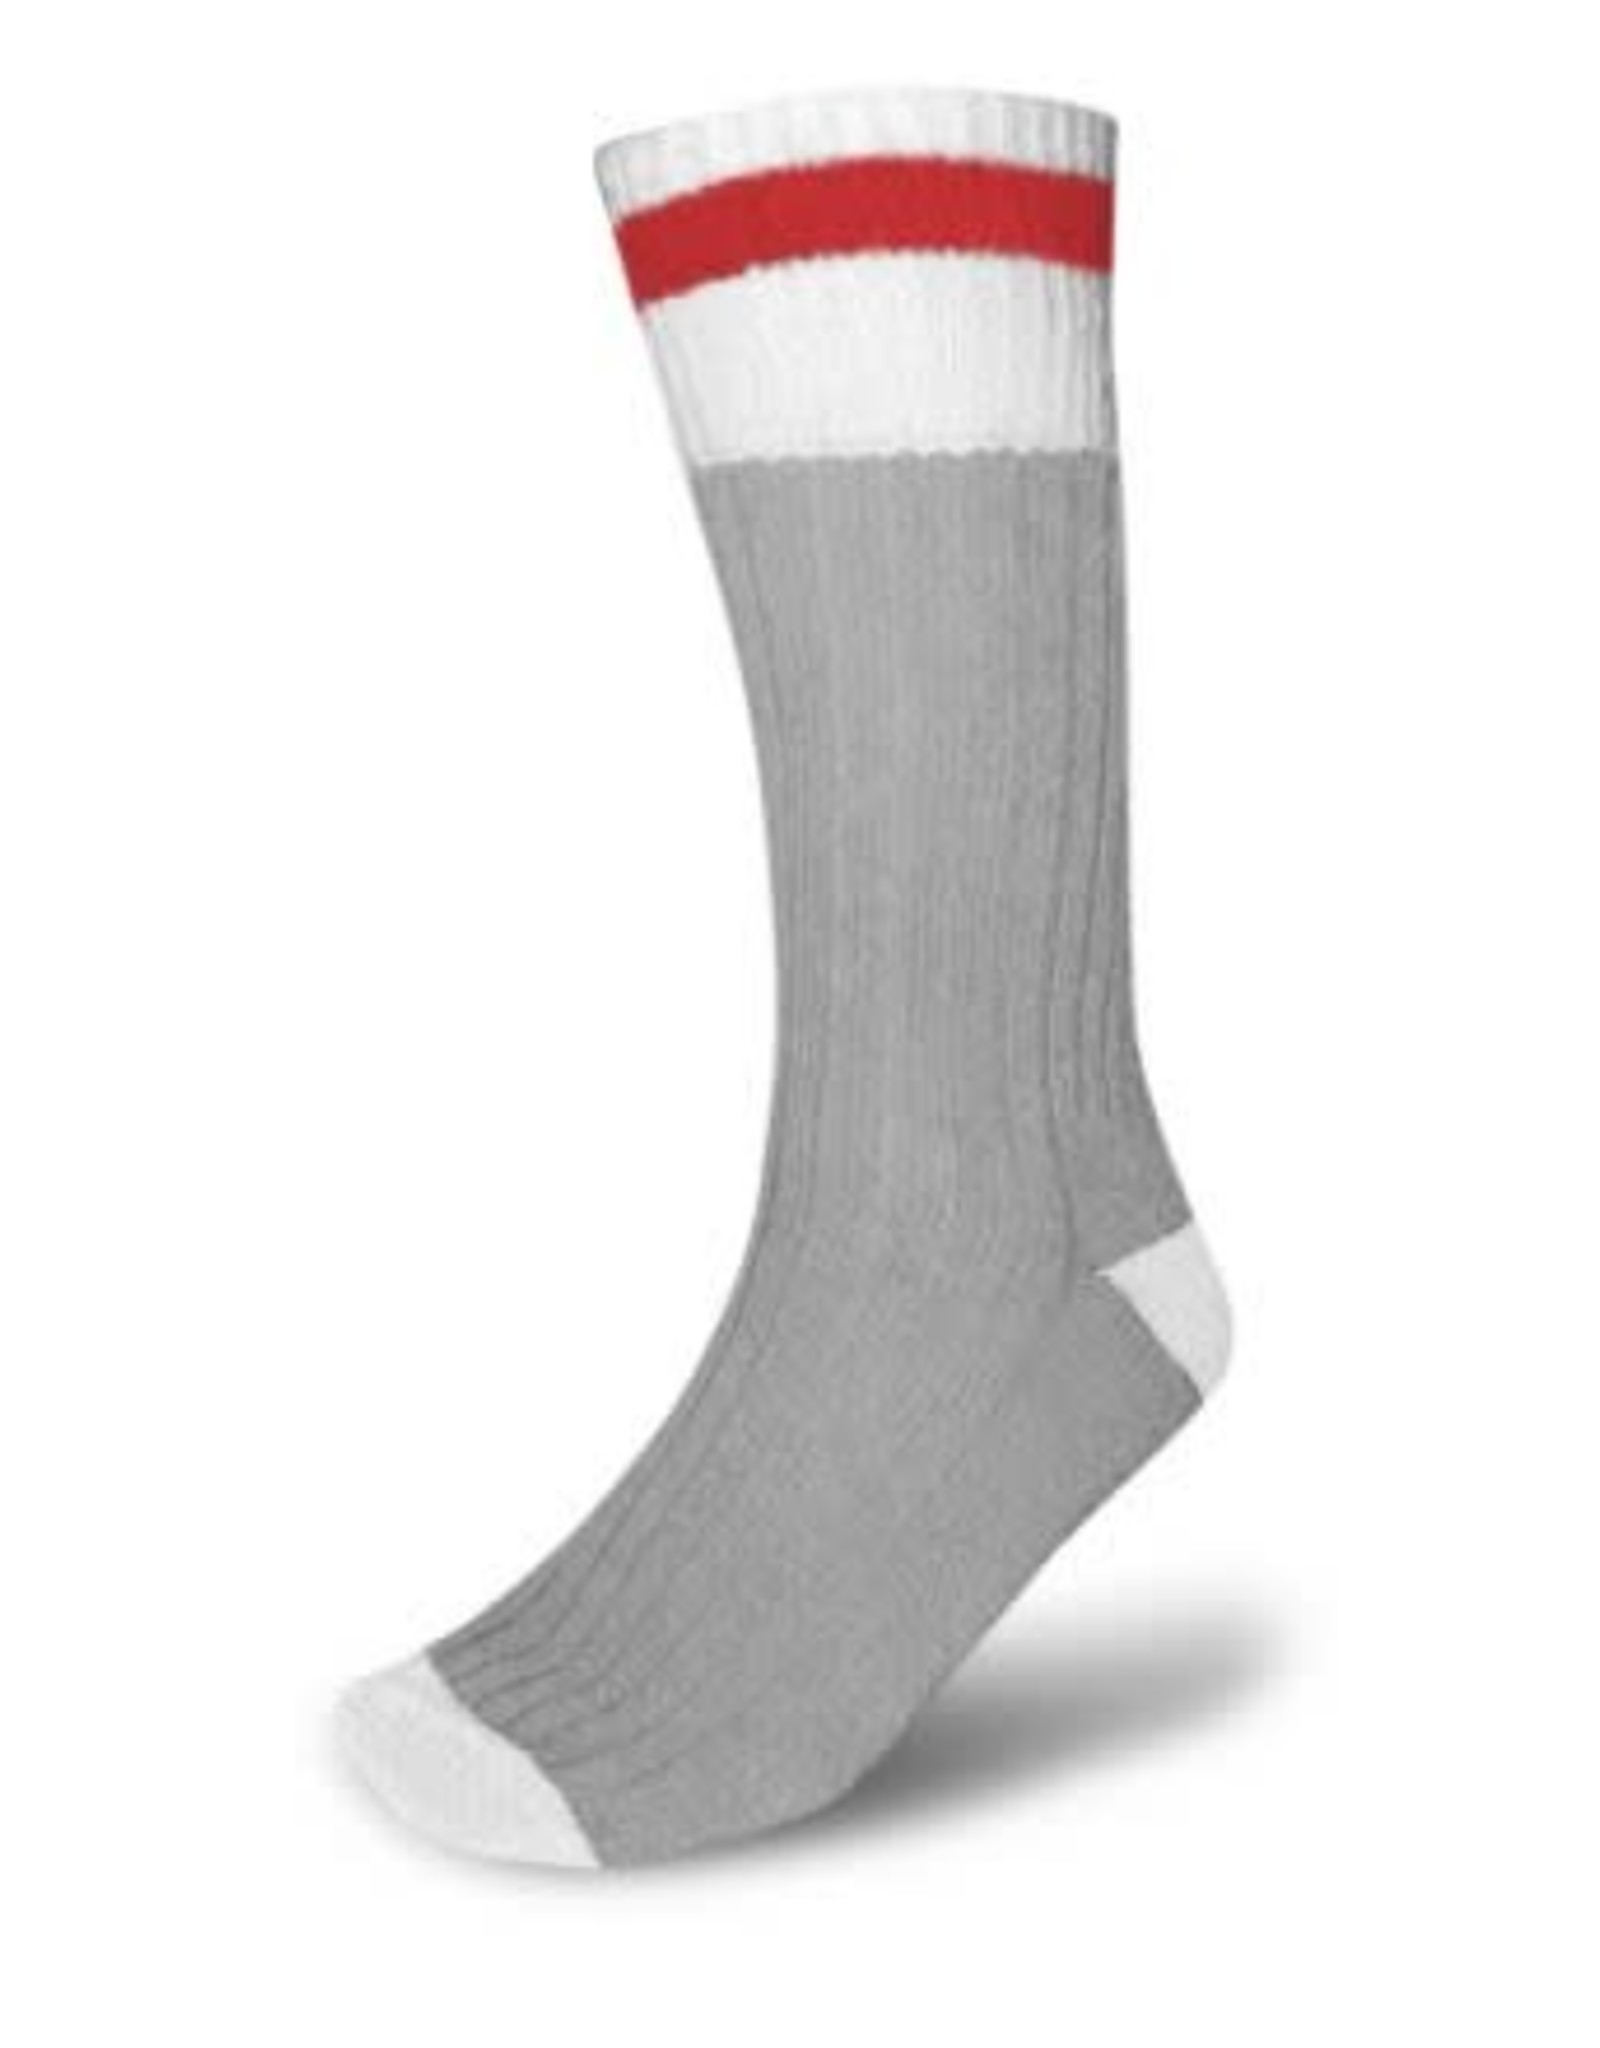 Pook Bas - Pook Classic Sock